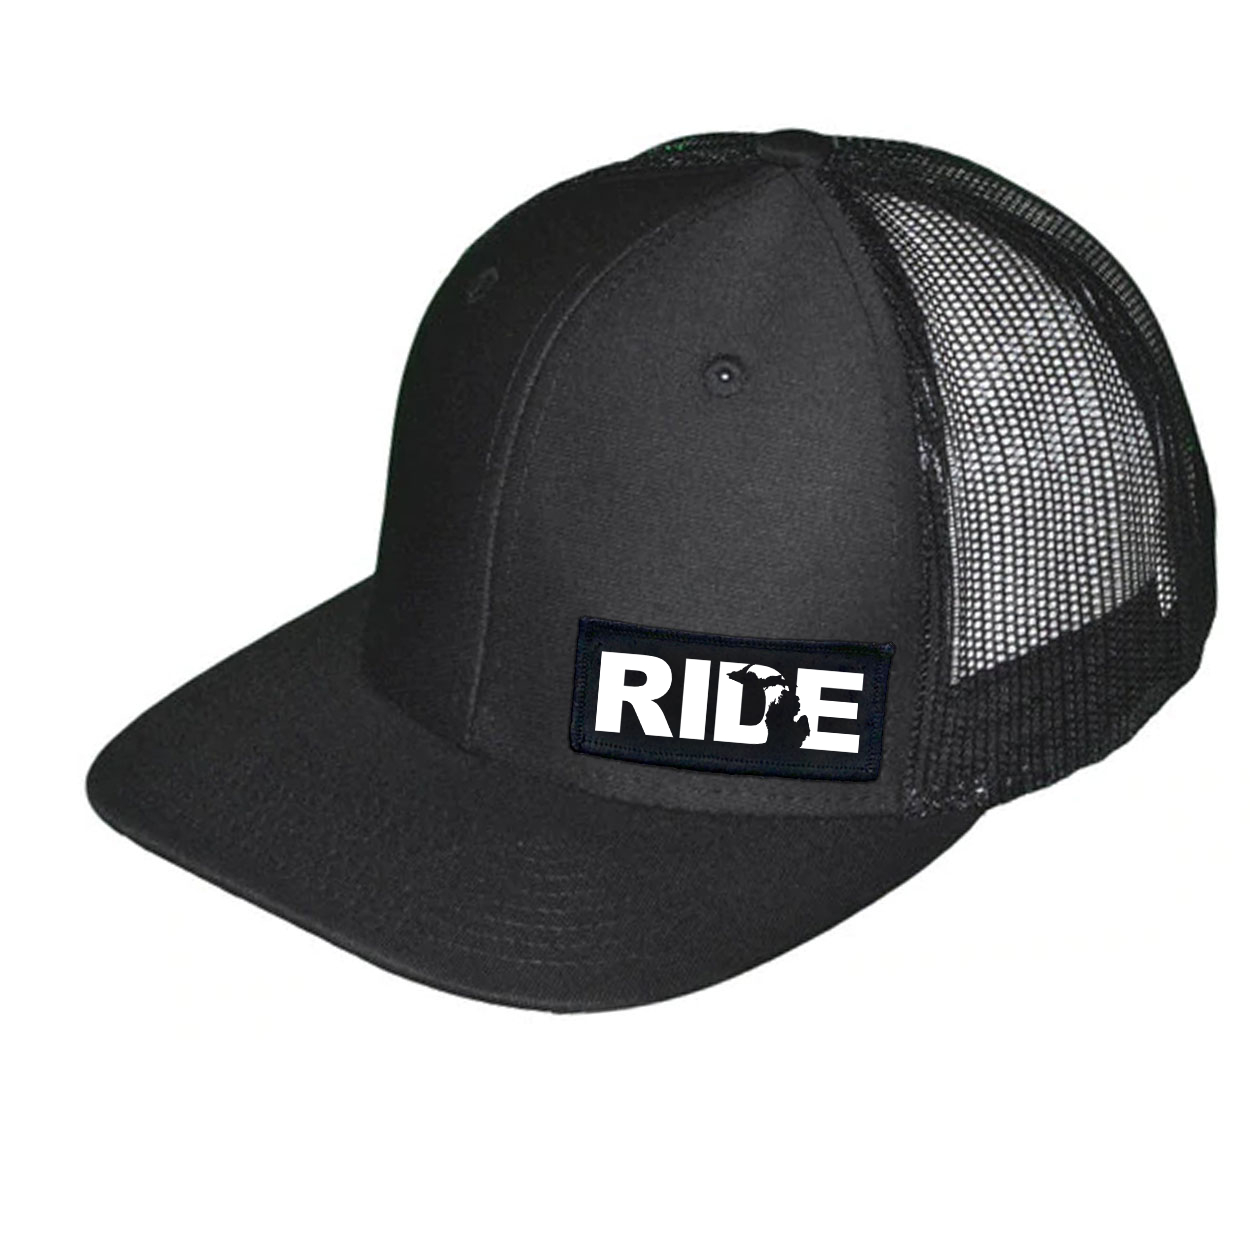 Ride Michigan Night Out Woven Patch Snapback Trucker Hat Black (White Logo)